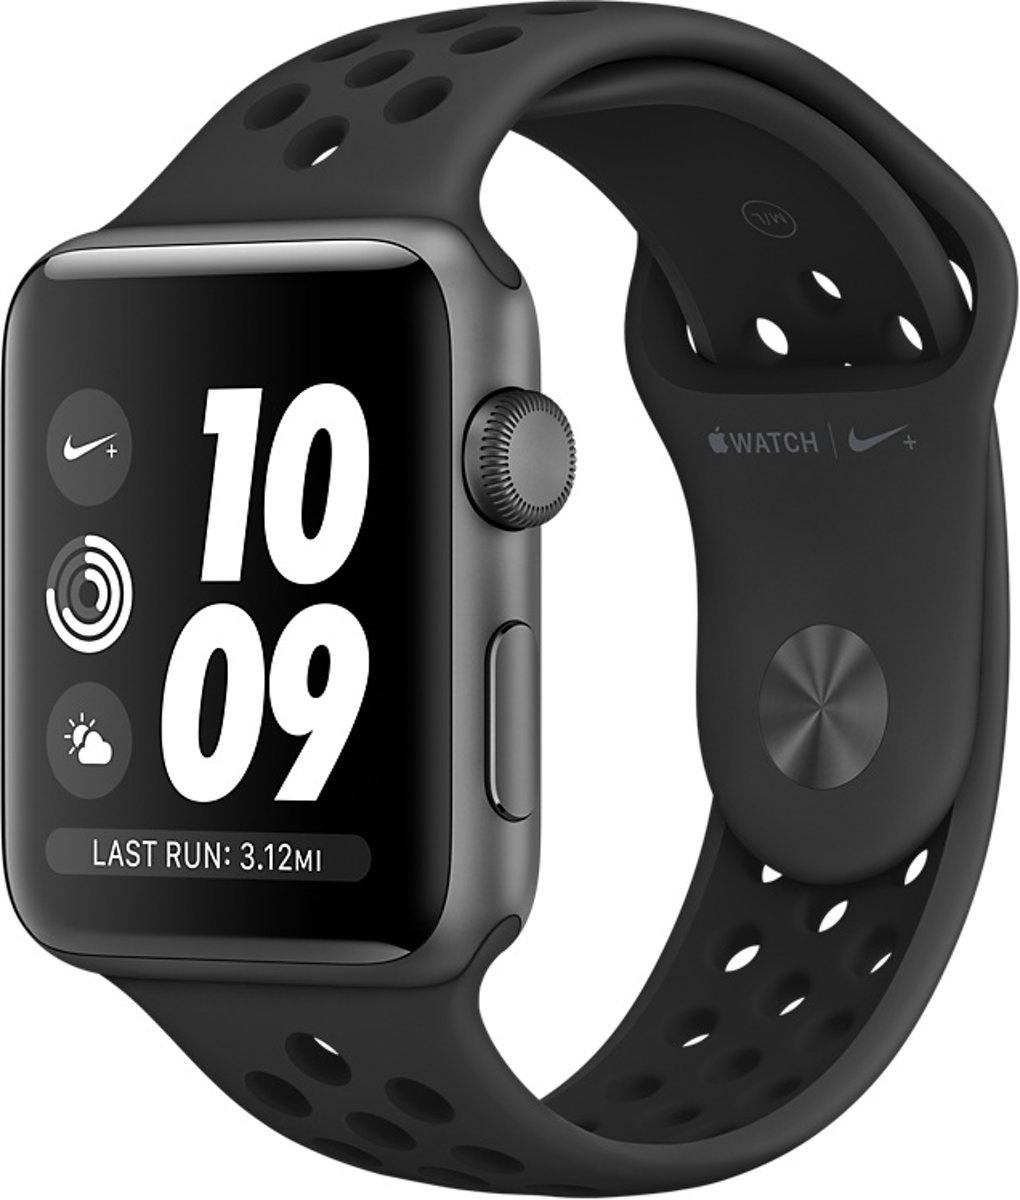 Apple Watch Series 3 Nike+ Smartwatch 38mm Spacegrijs Aluminium / Antraciet Zwart Sportband